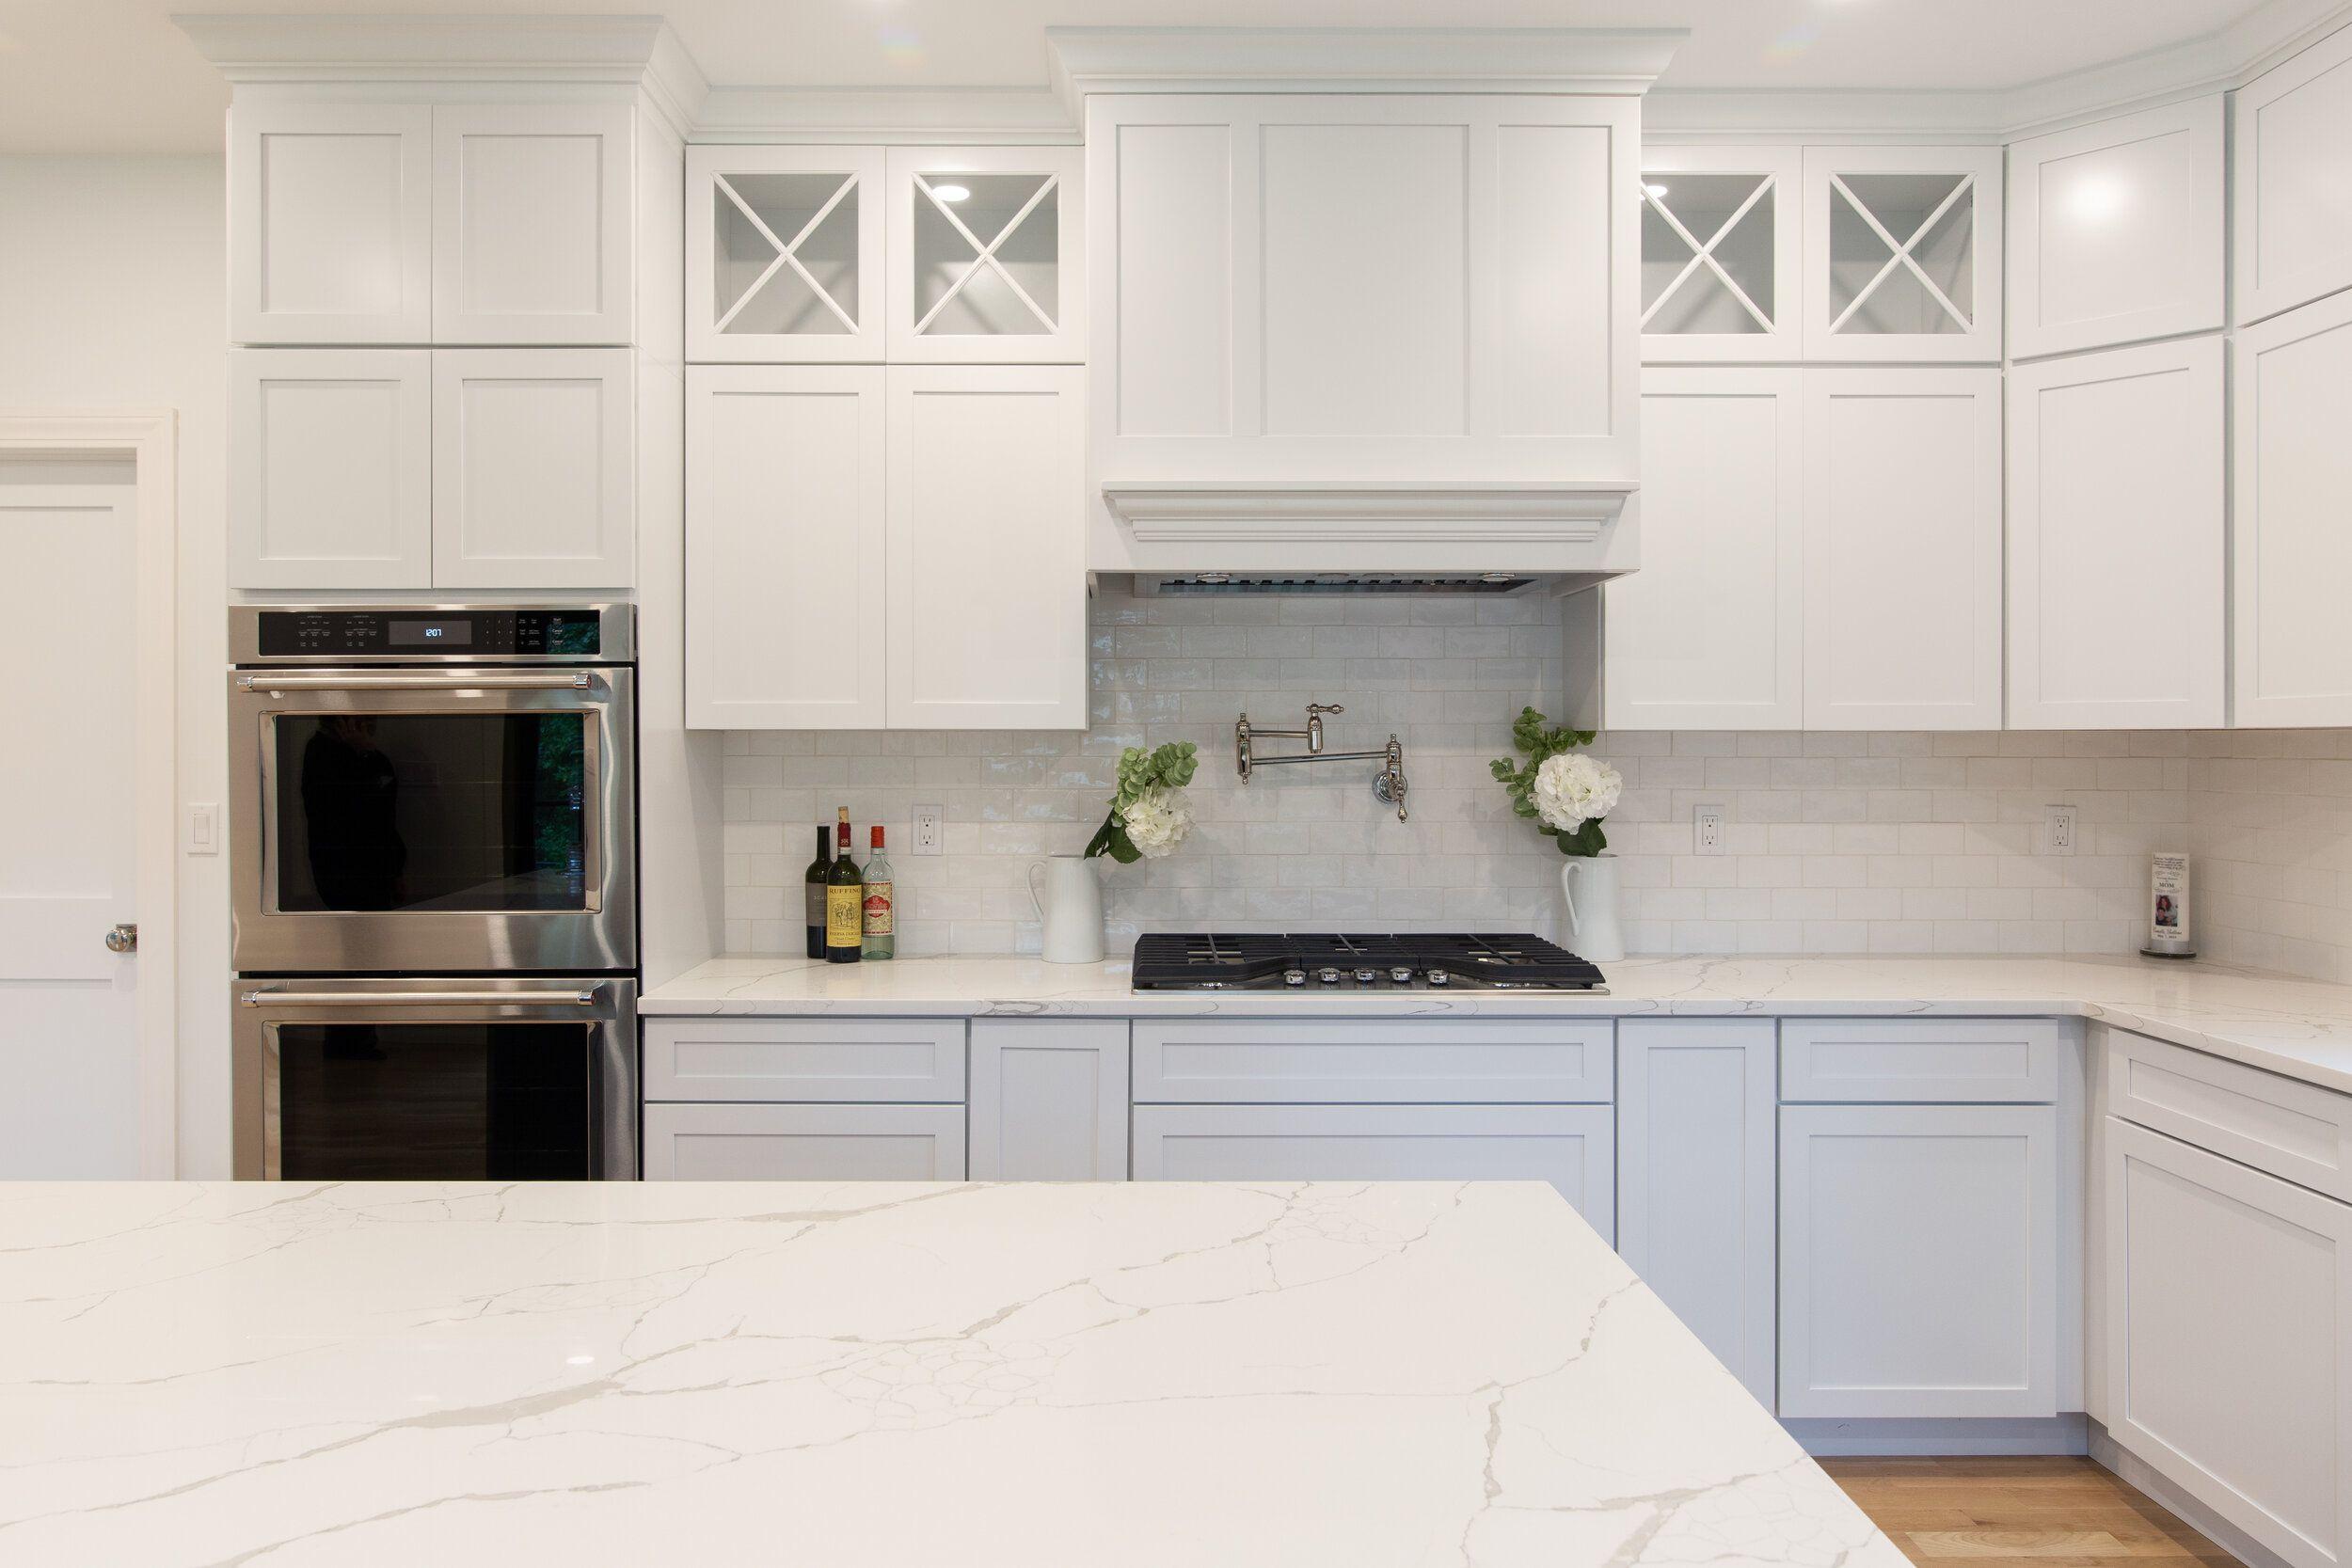 Gothamkitchenbath Com In 2020 Quality Kitchen Cabinets ...